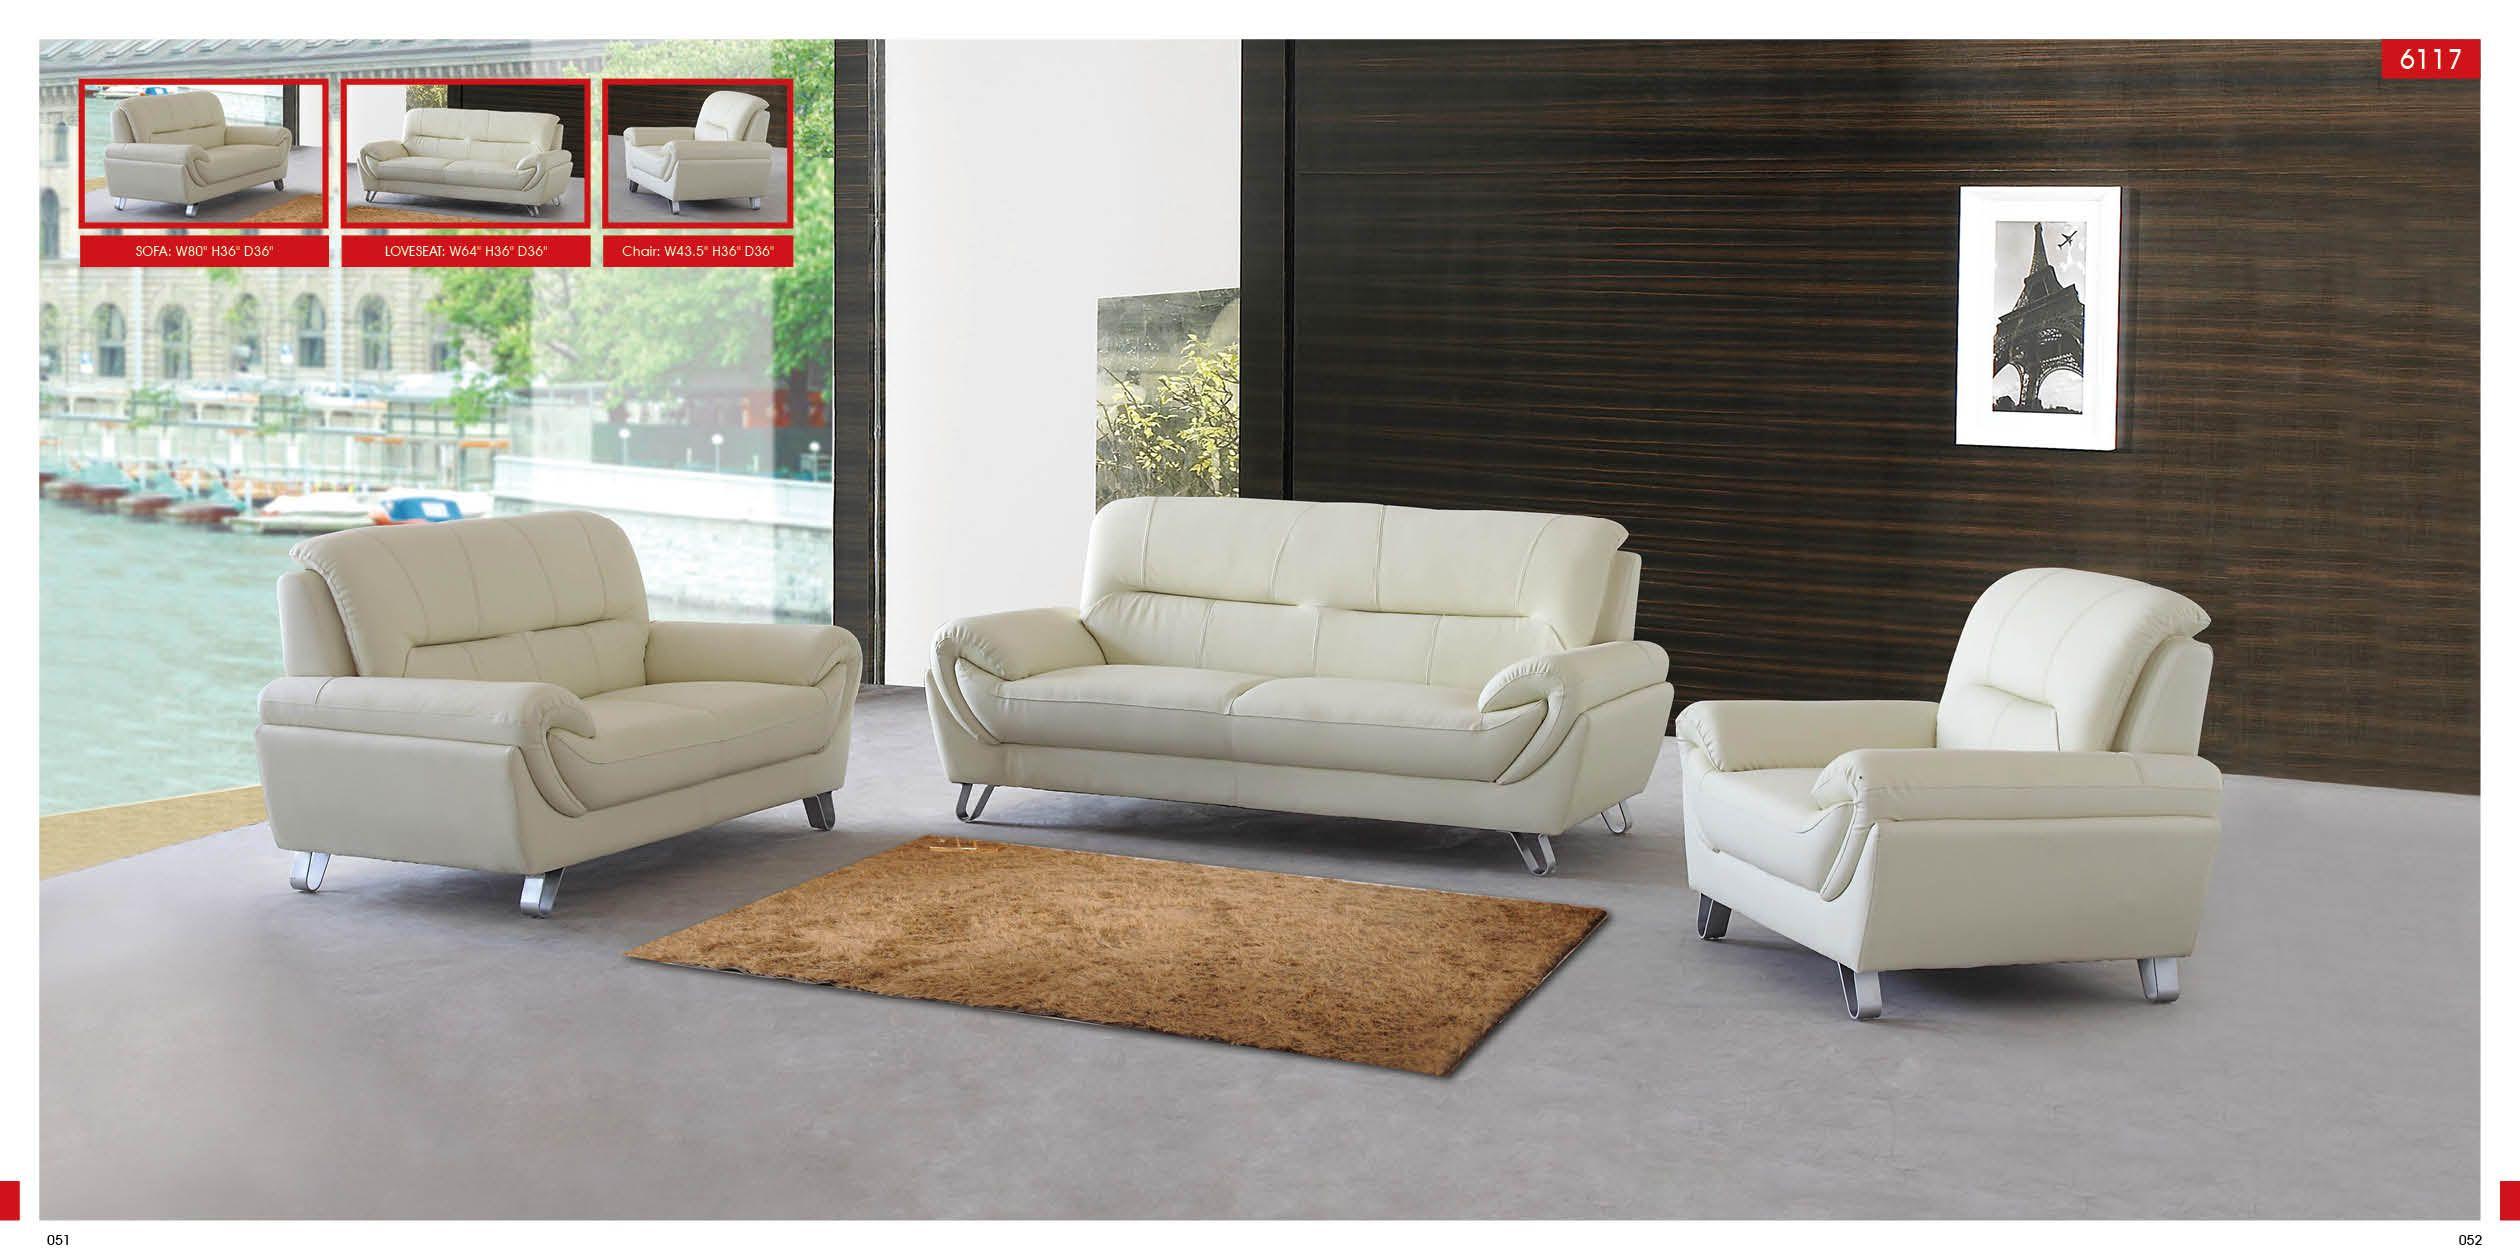 Modern Off White Leather 3 PC Sofa Set | Ikea living room ...